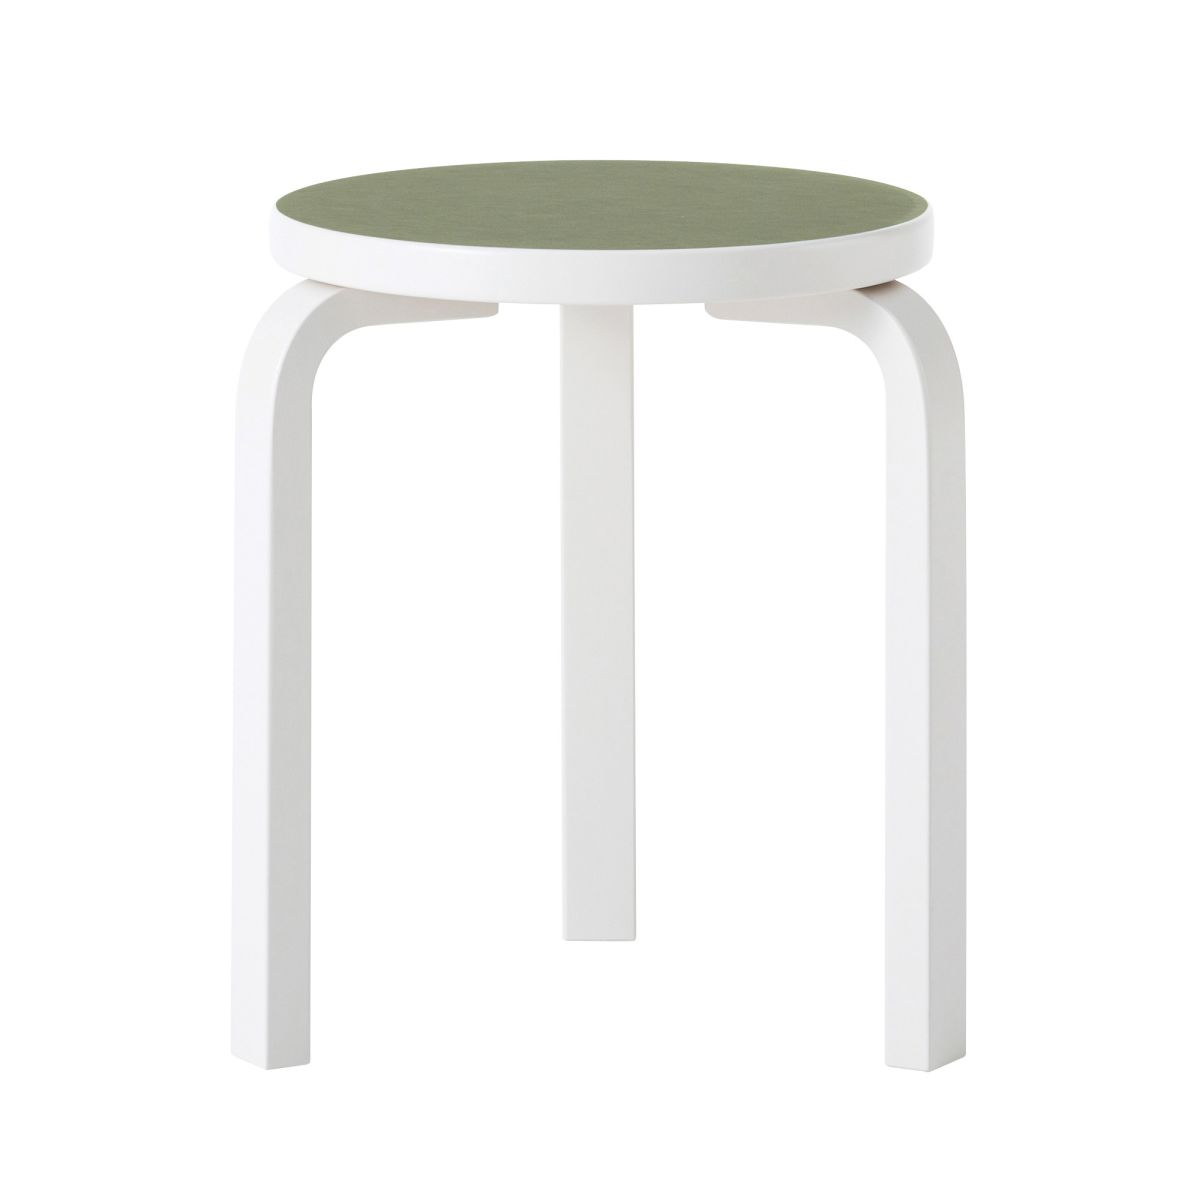 Stool-60-Stone-White-Lacquer-Olive-Linoleum_1-1903748